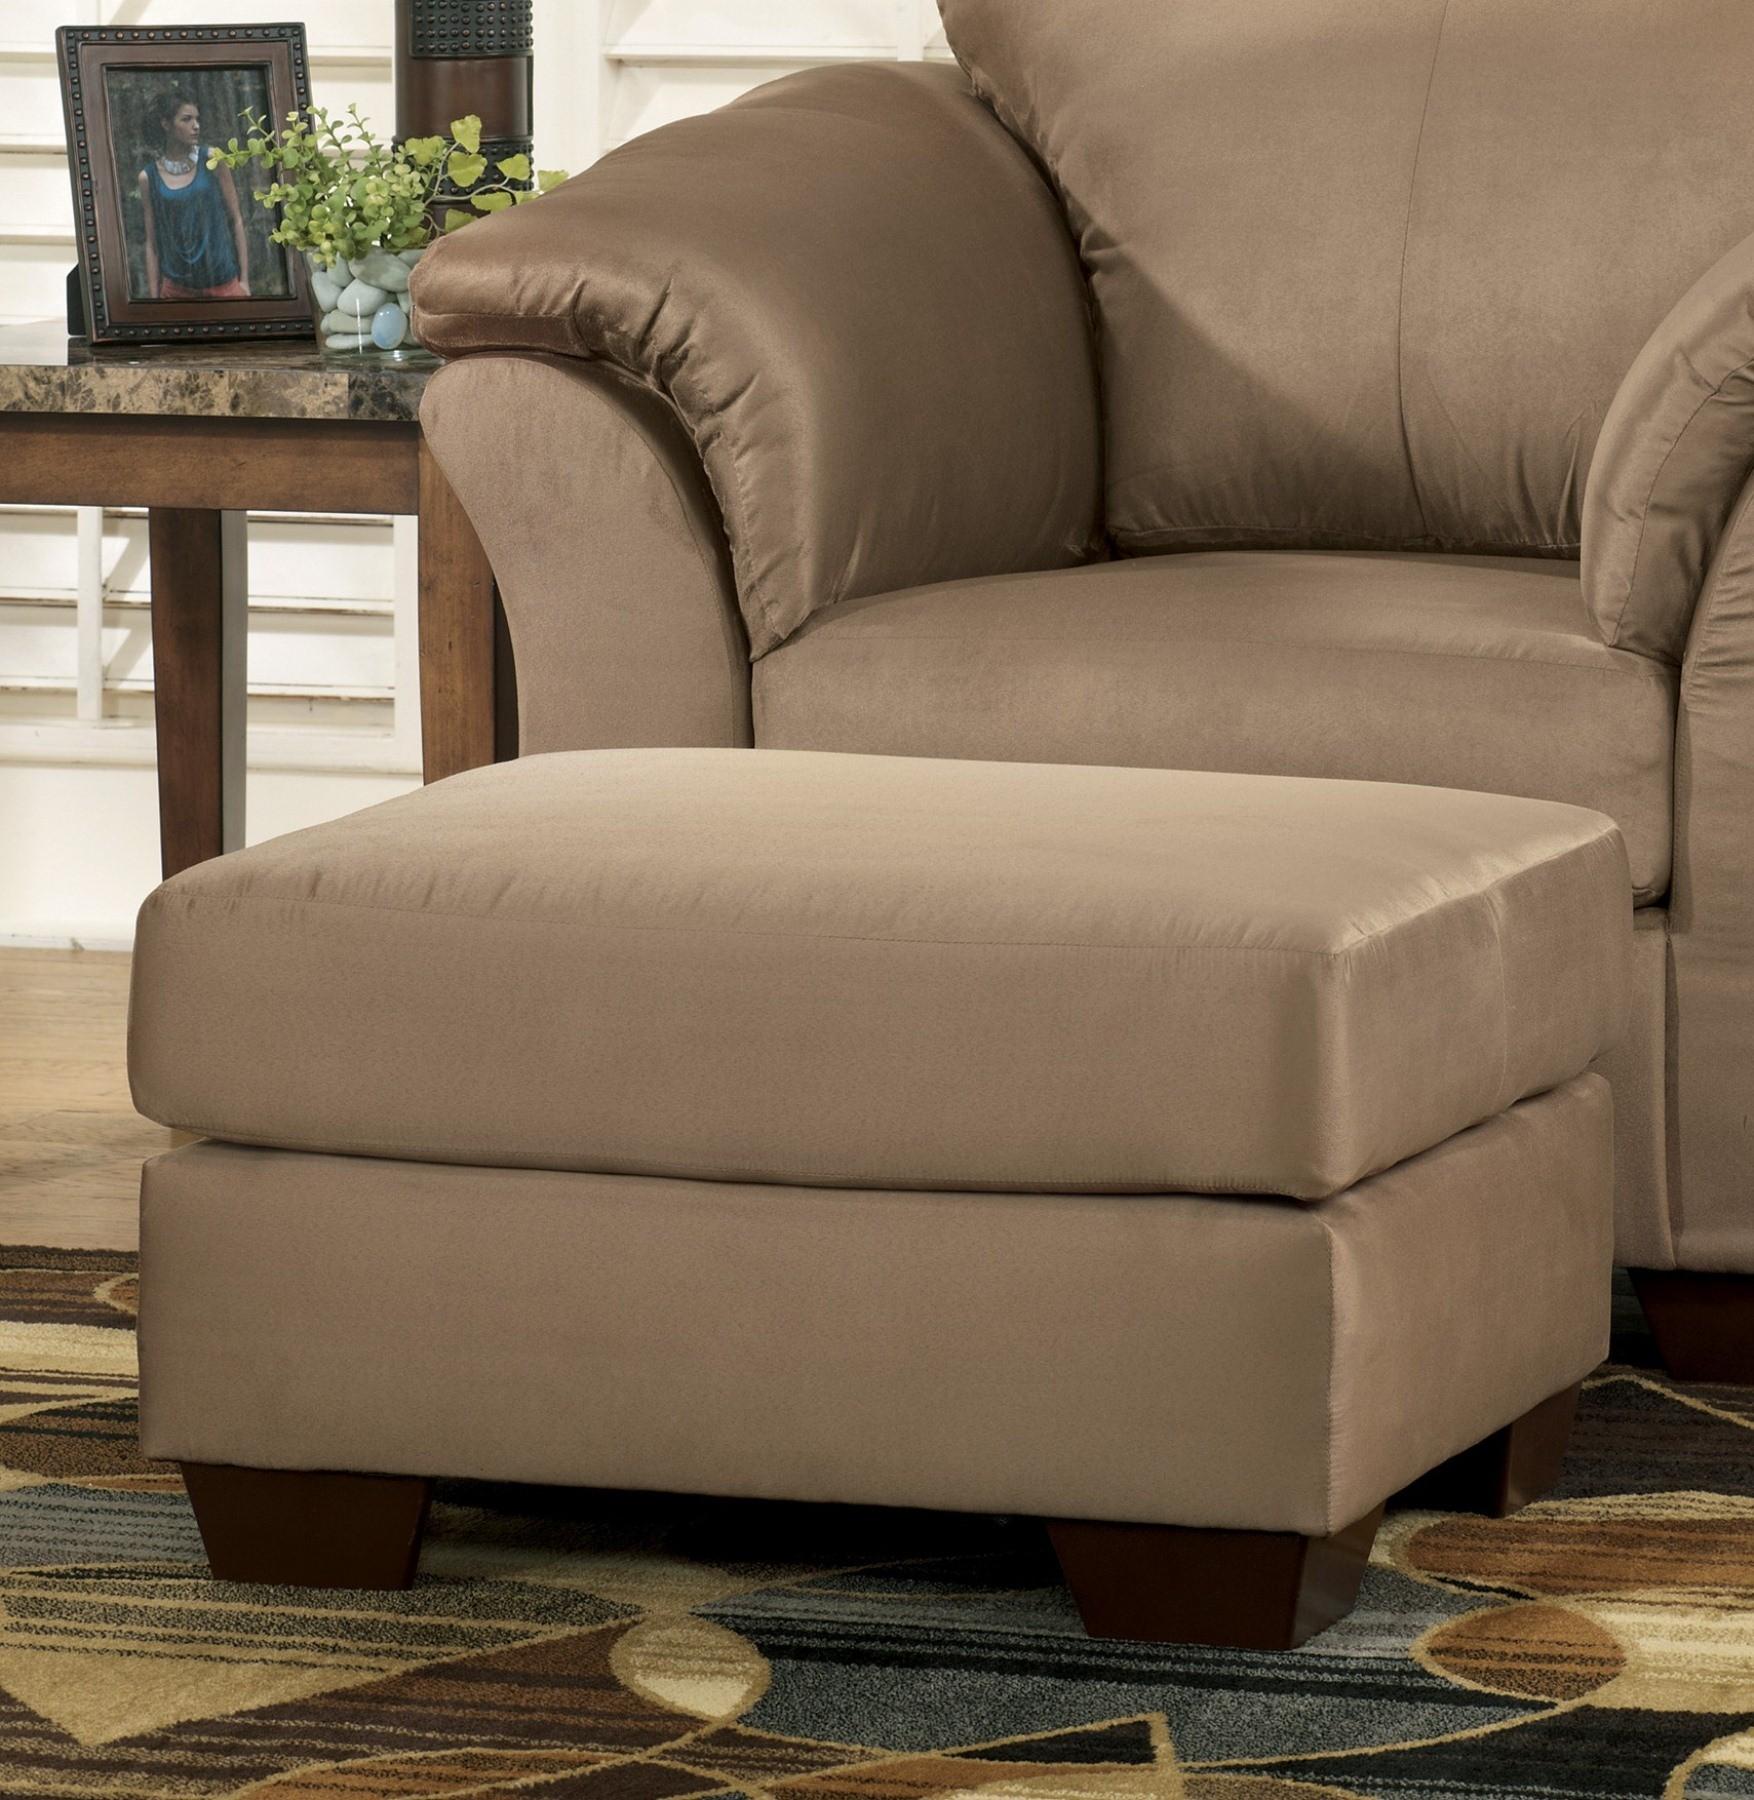 Darcy Mocha Ottoman From Ashley 7500214 Coleman Furniture